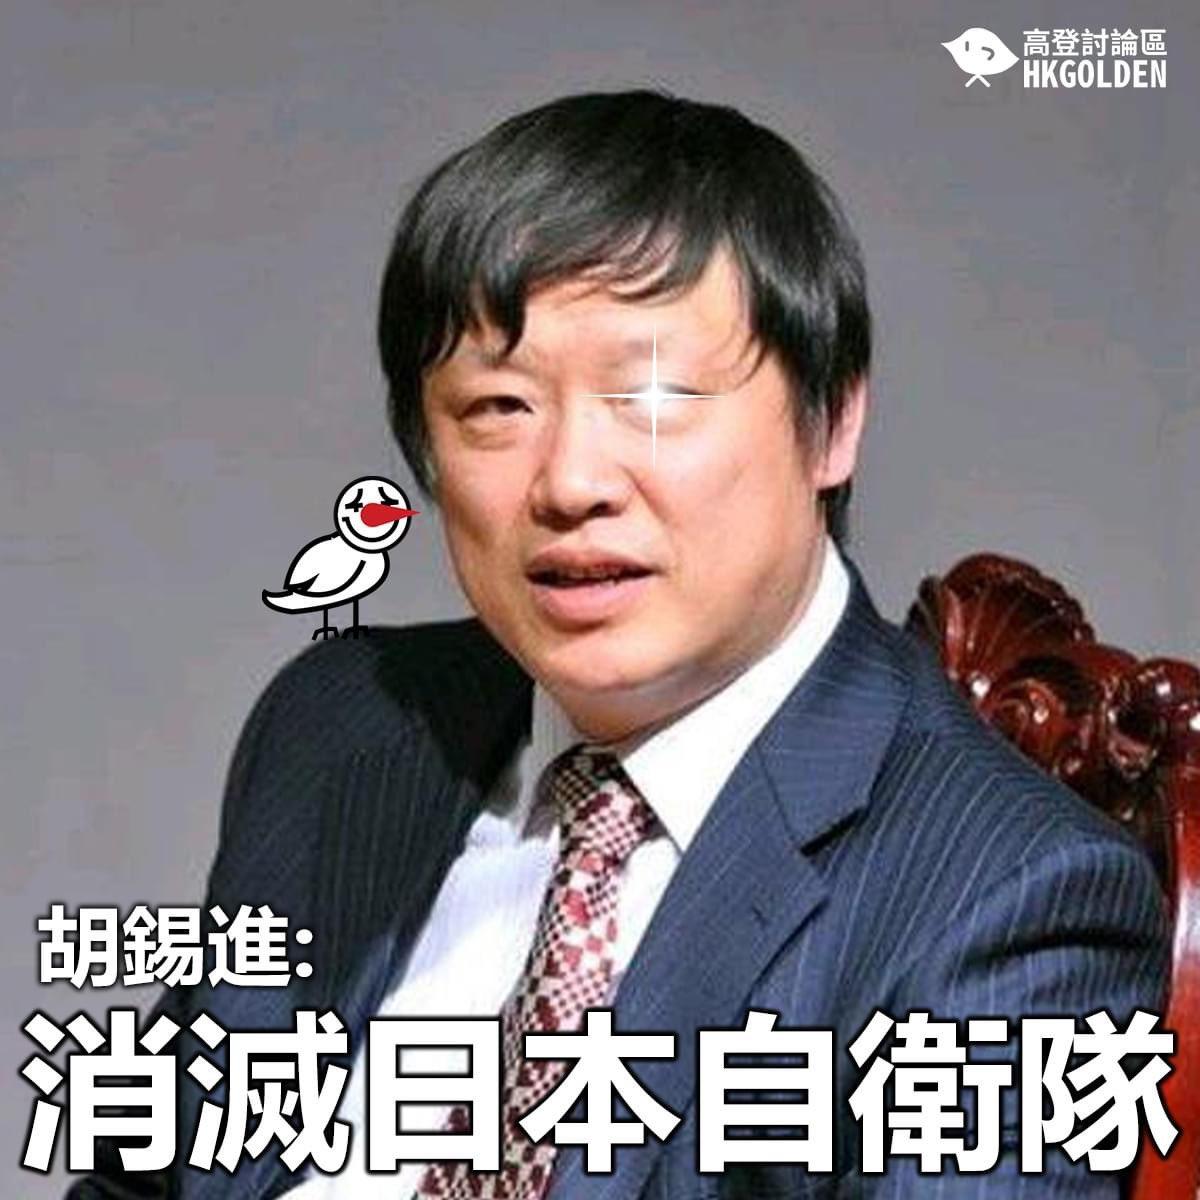 Twitter 大野 智 大野智が退所しても「4人で嵐を再開」はあり得るか? 櫻井翔の意味深発言